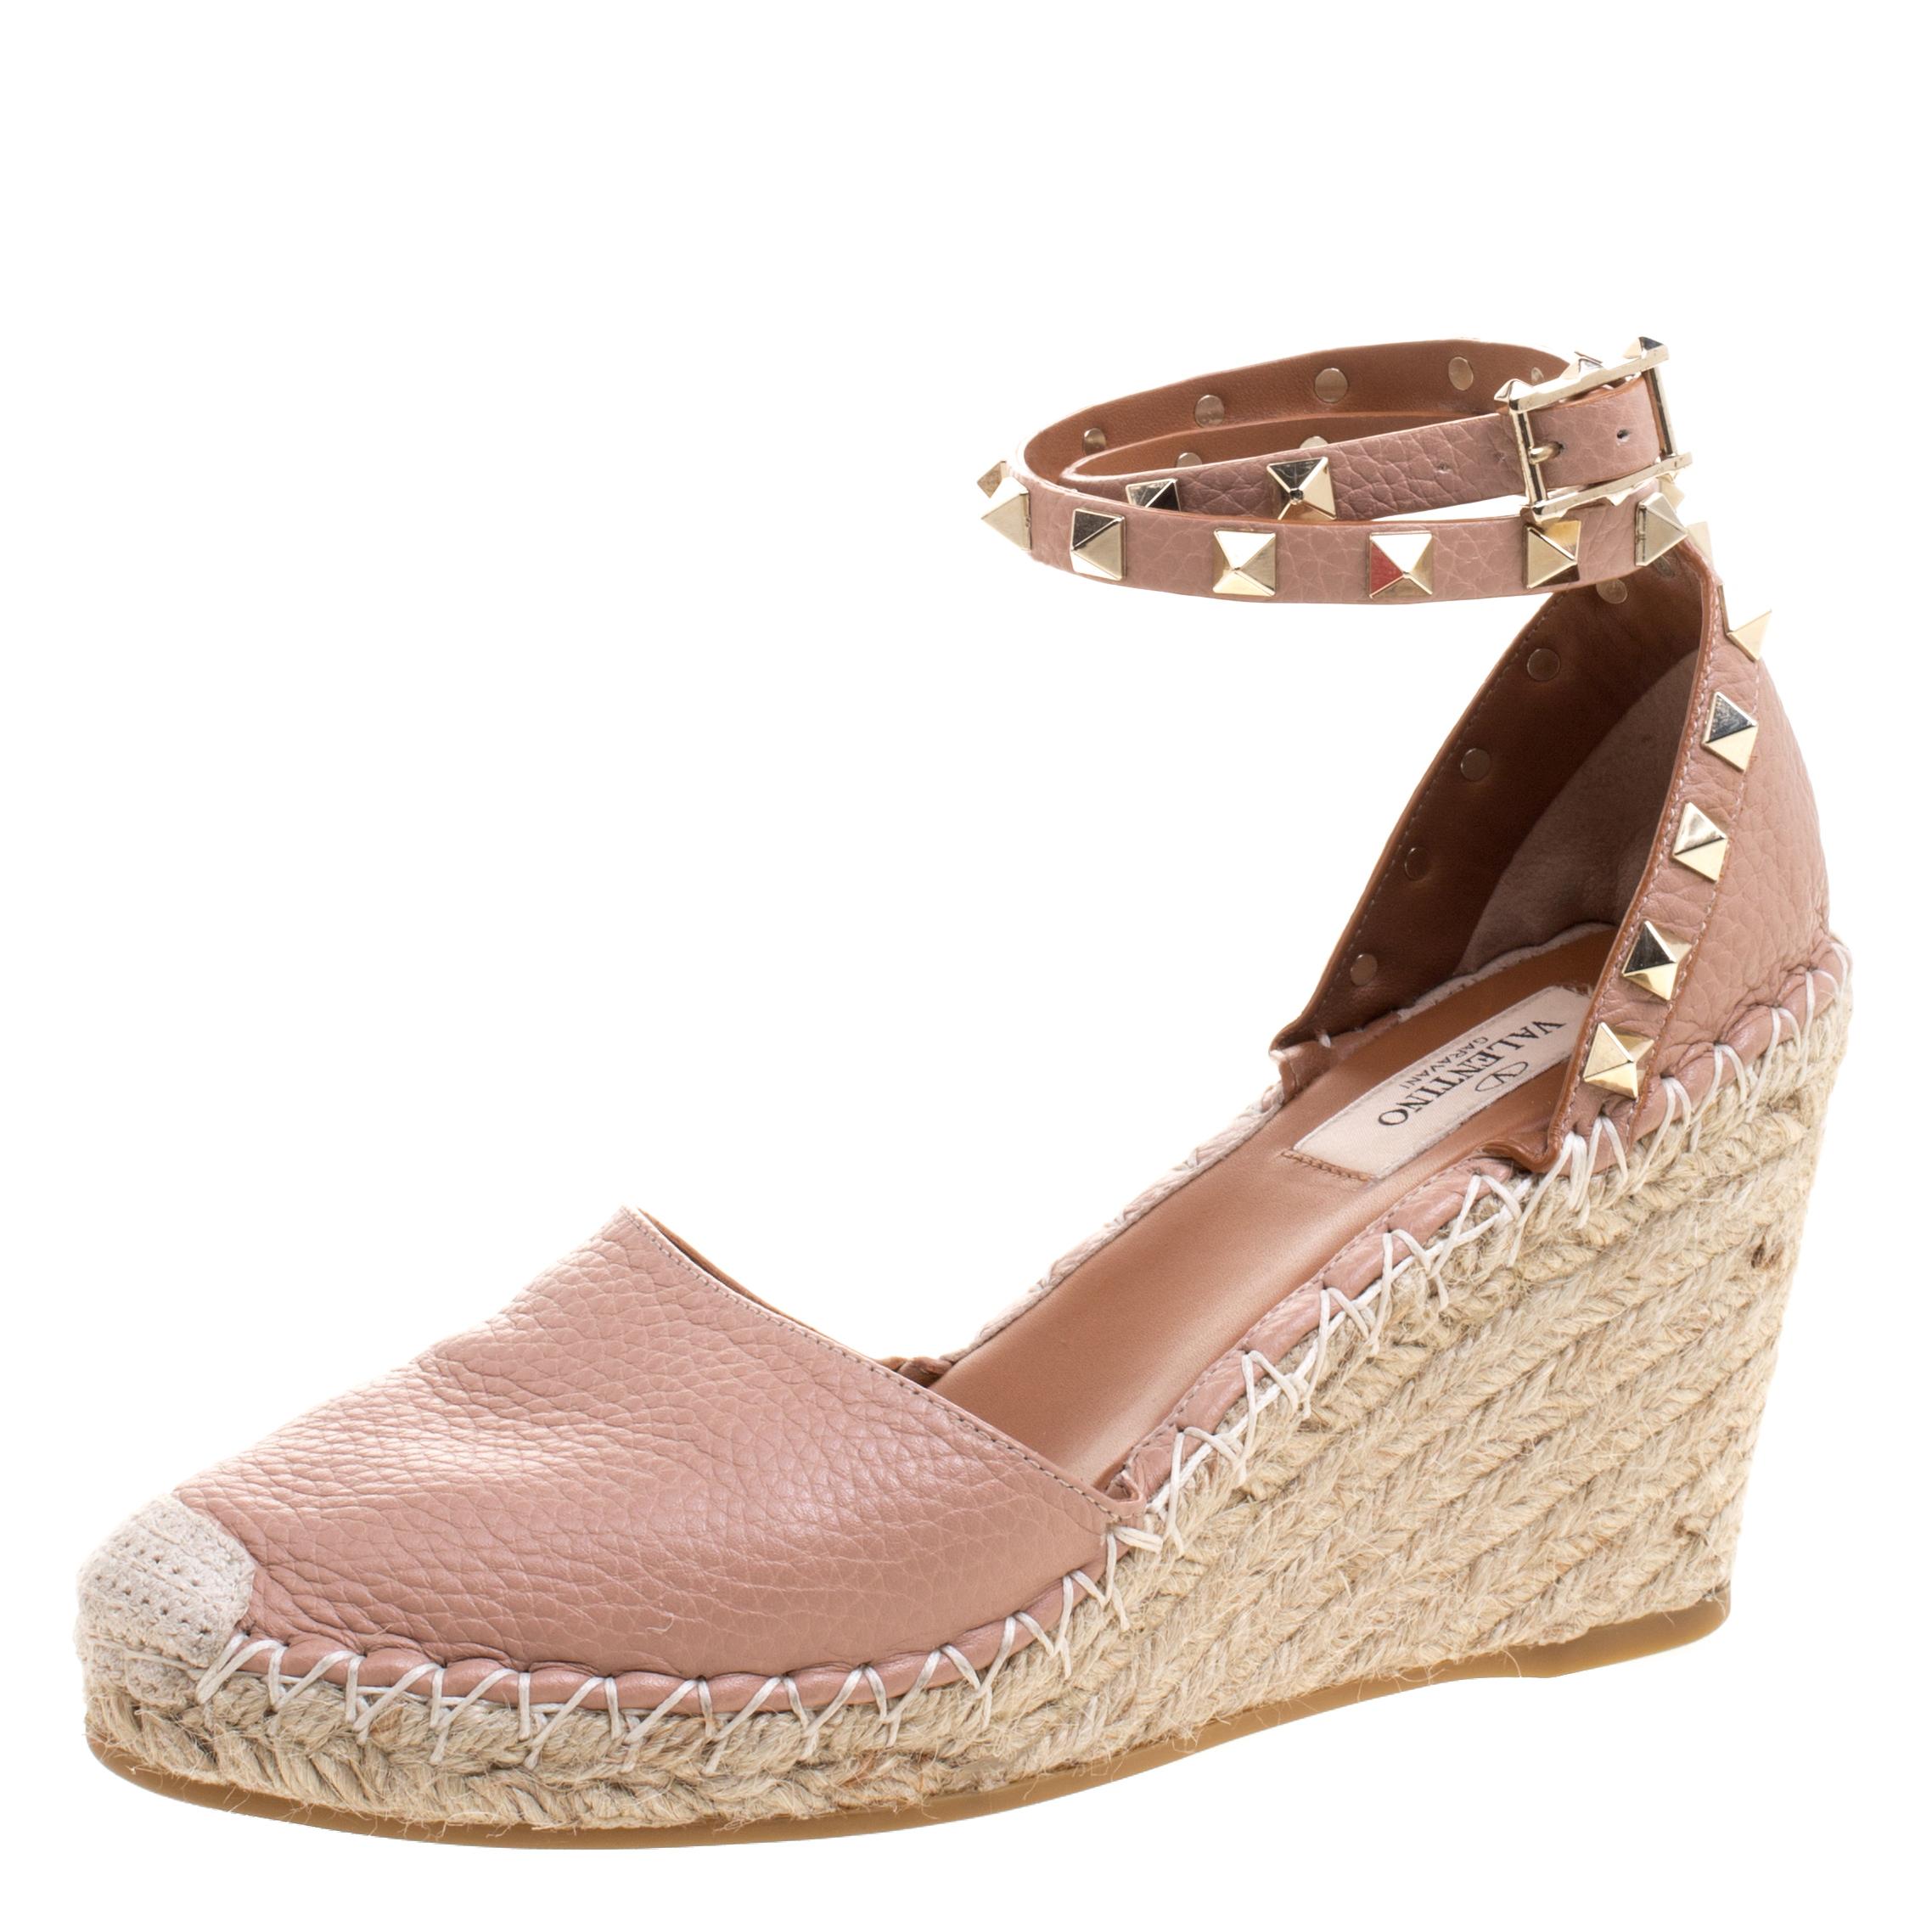 799c3cc7884 ... Ankle Strap Wedge Espadrille Sandals Size 37. nextprev. prevnext